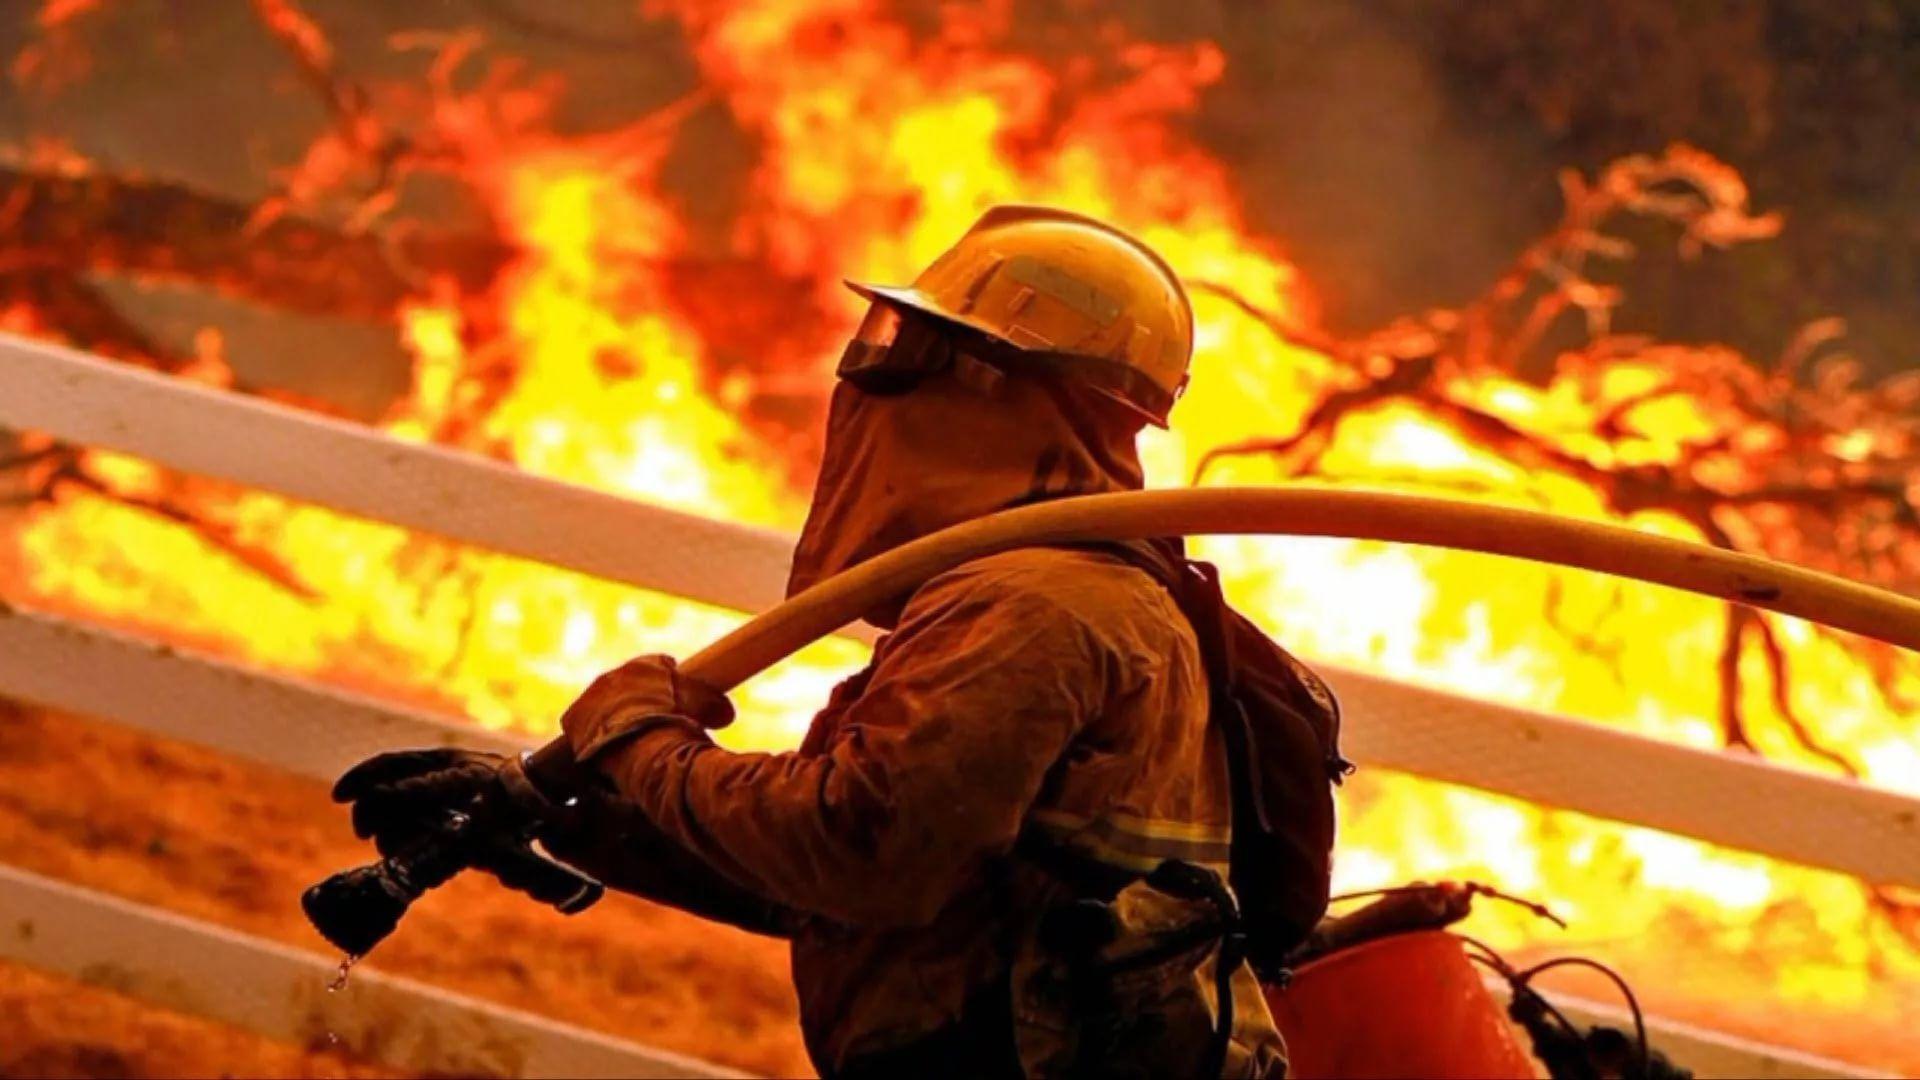 Firefighter free download wallpaper